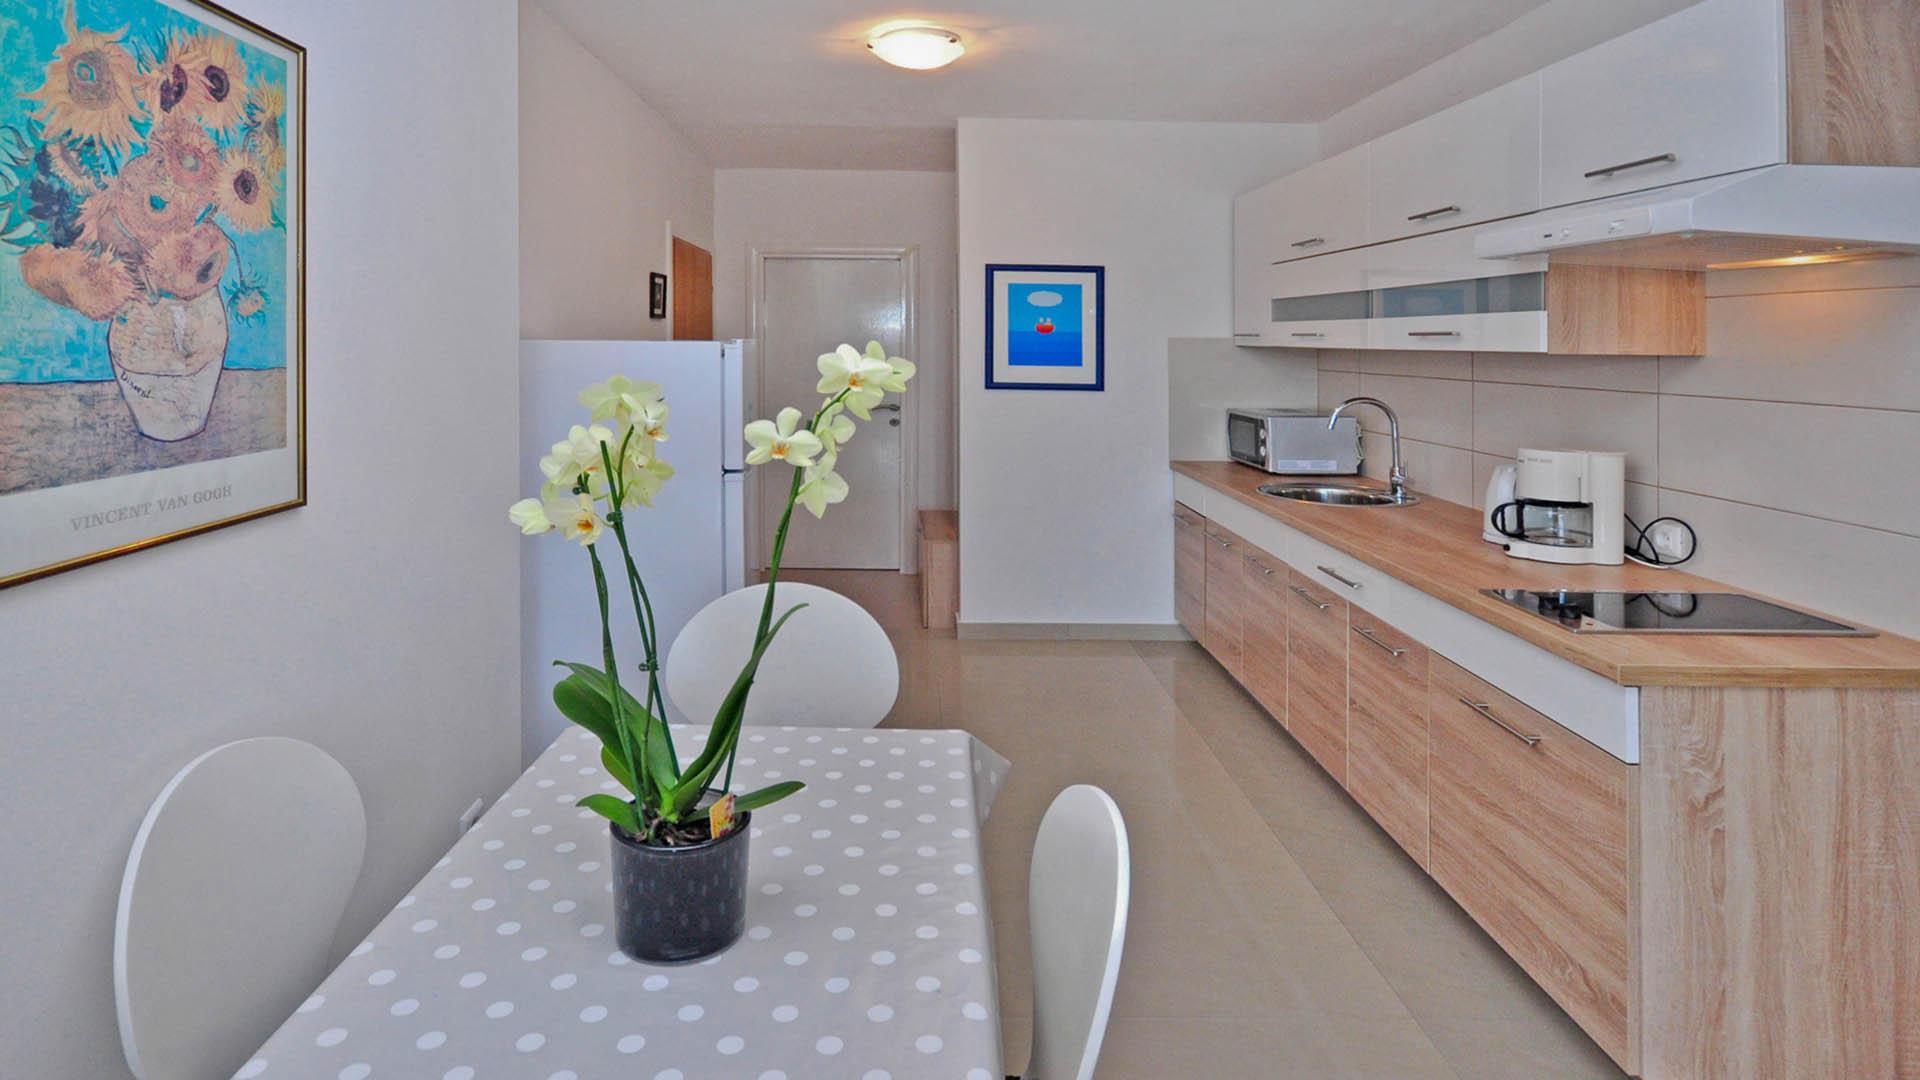 Omiš rezidencijalni apartman kuhinja